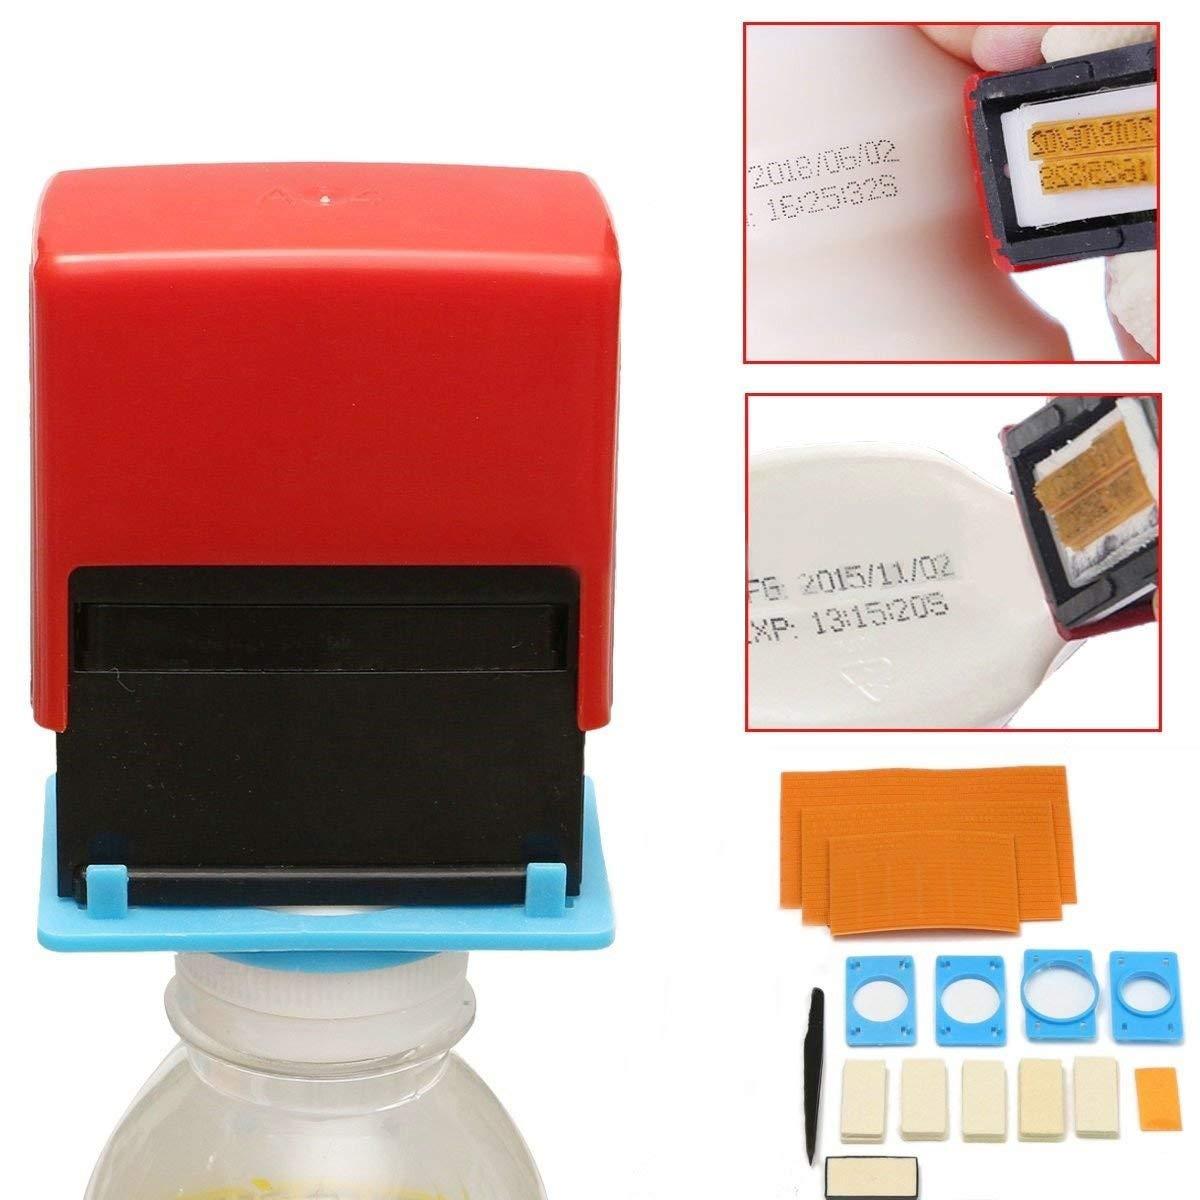 Baoshishan Handheld Printer Code Tool A4 Portable Printing